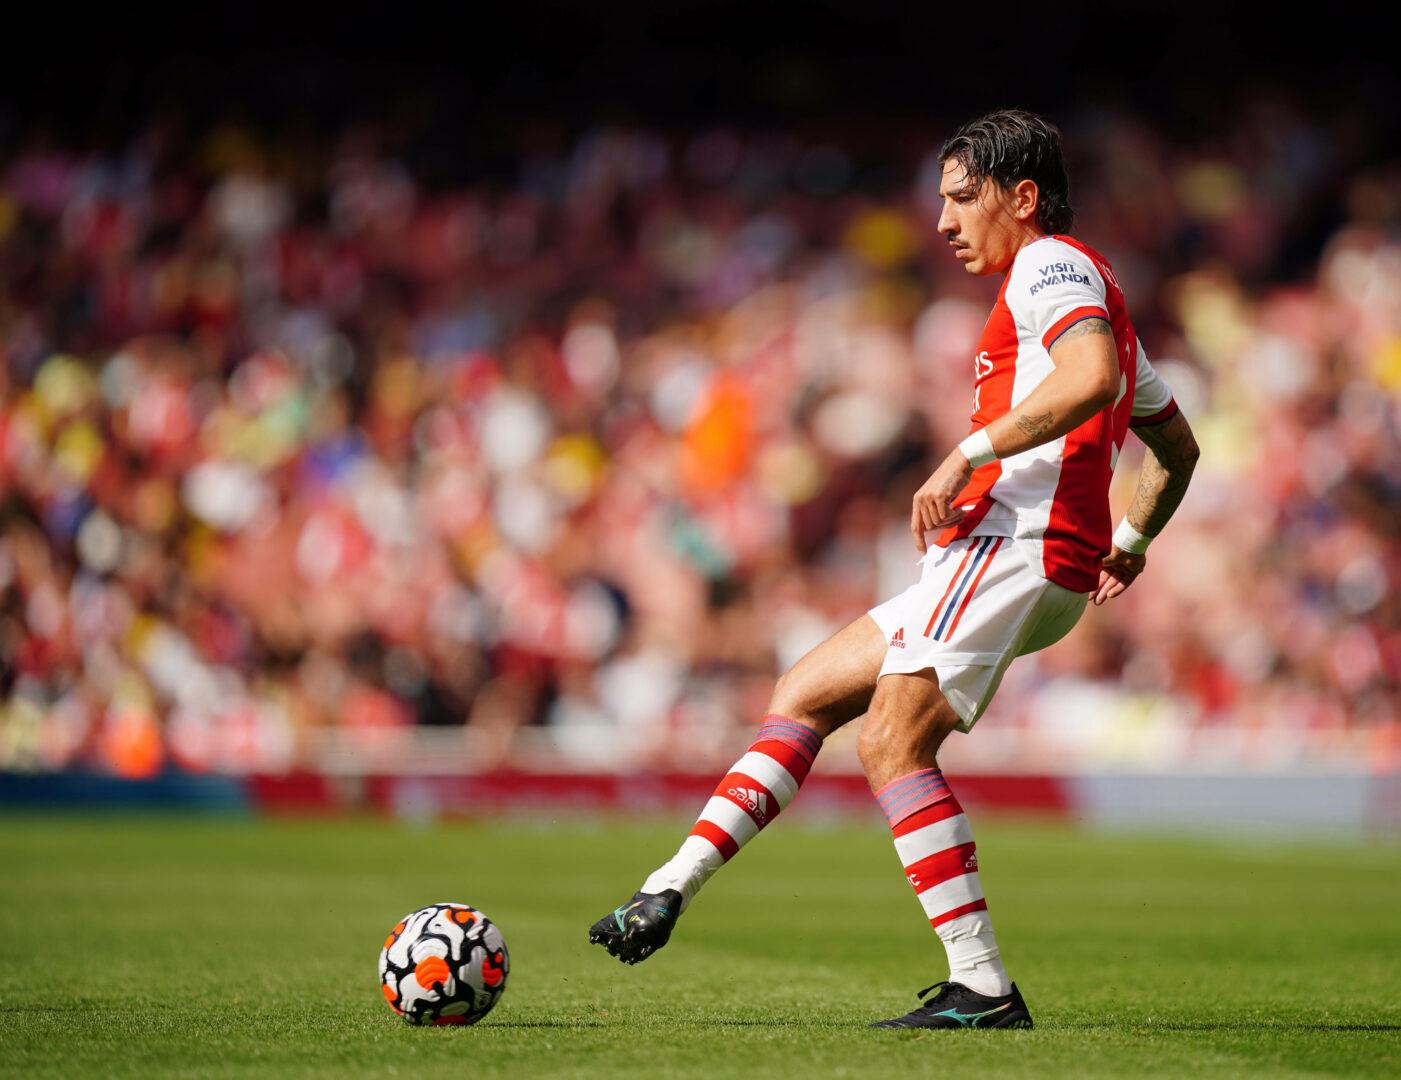 Arsenal: Hector Bellerin wechselt zu Real Betis